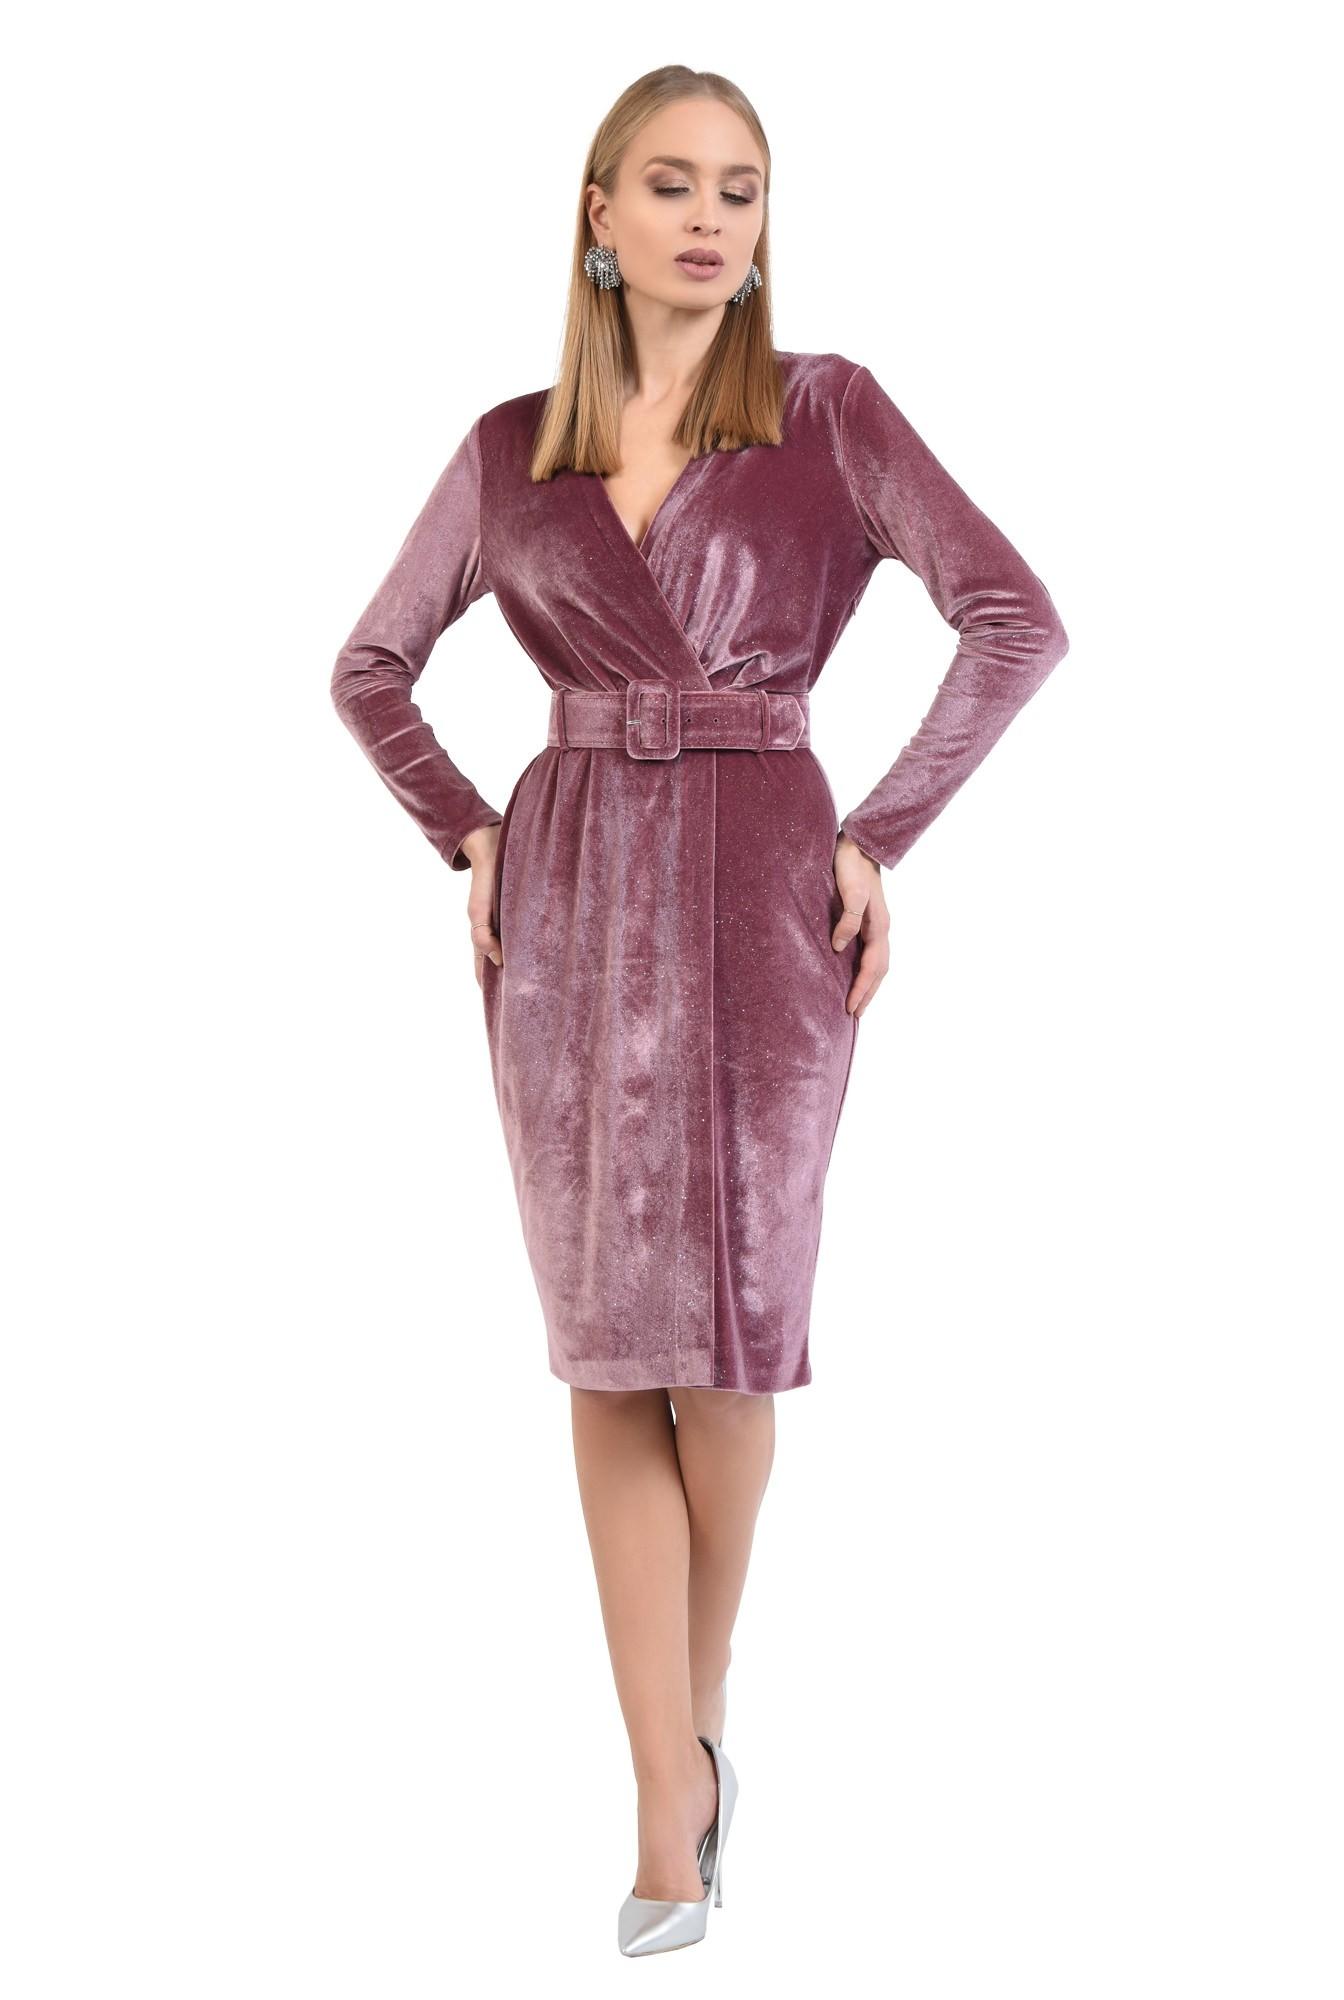 3 - 360 - rochie eleganta, croi conic, anchior petrecut, curea lata